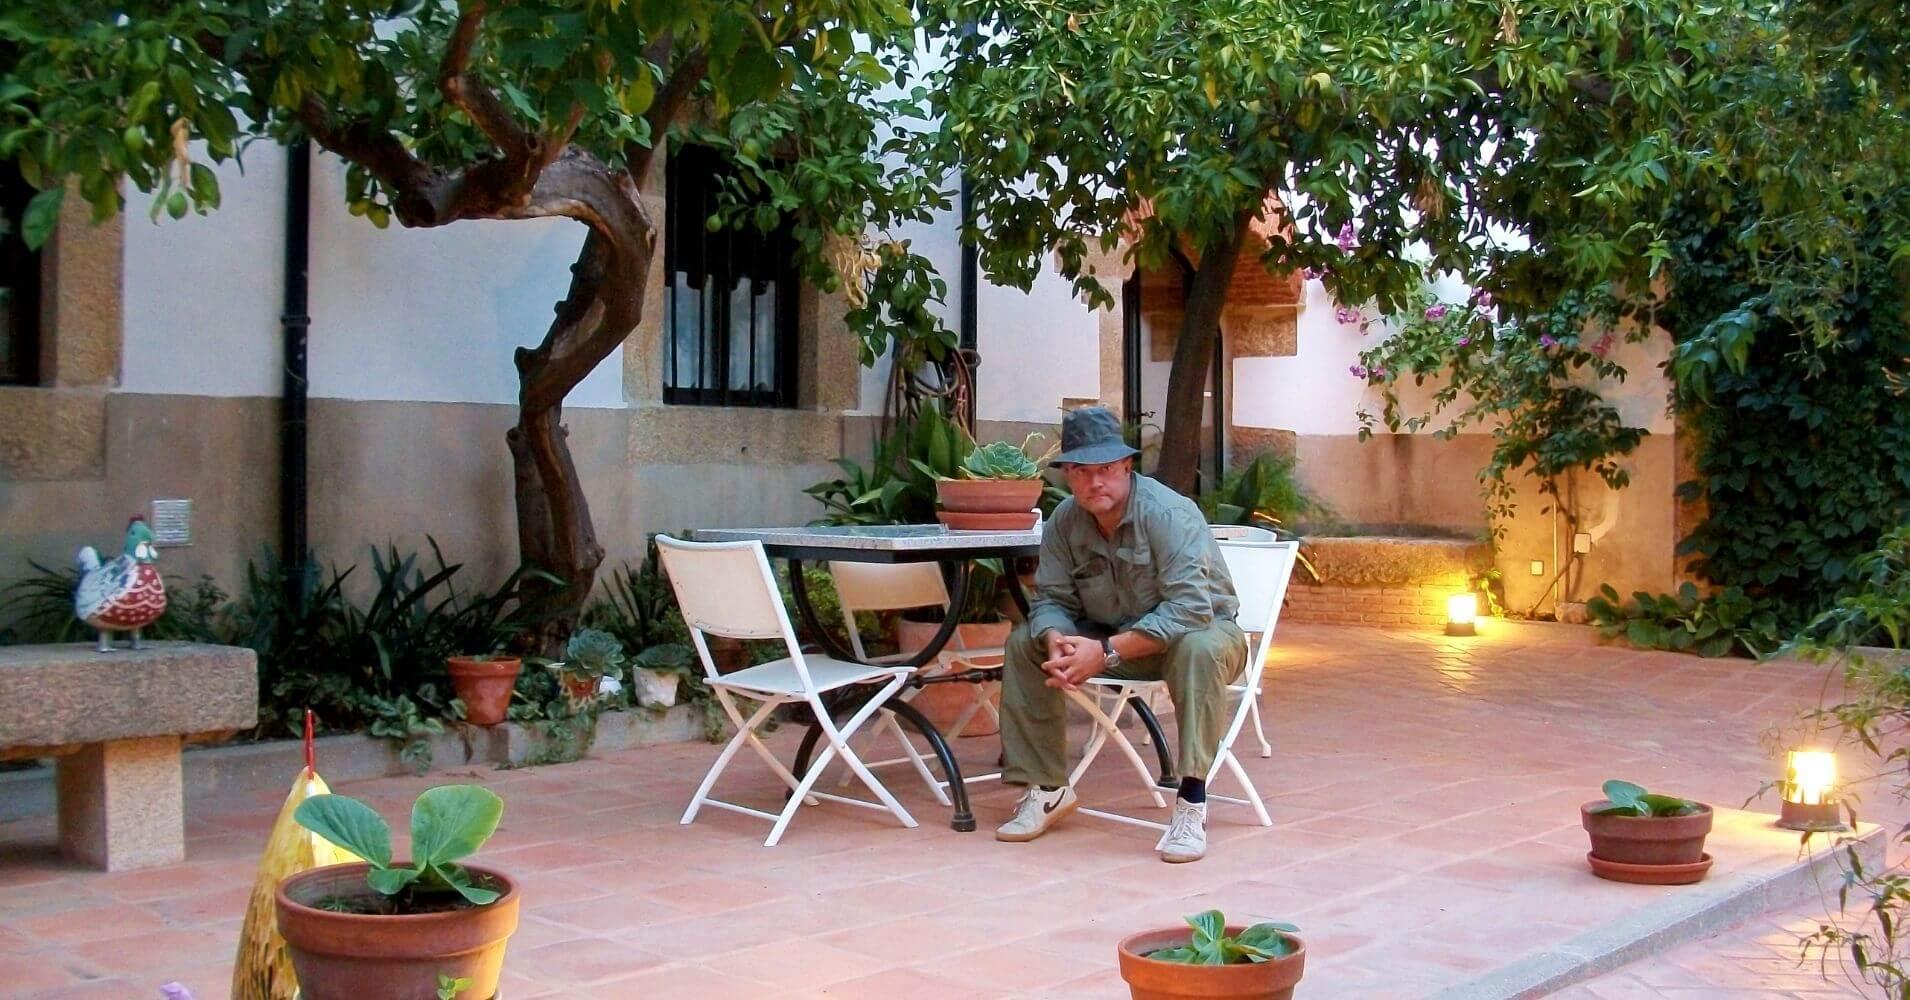 Casa Rural Antolina. Valle de Jálama Misterio de A Fala. San Martín de Trevejo. Cáceres. Extremadura.